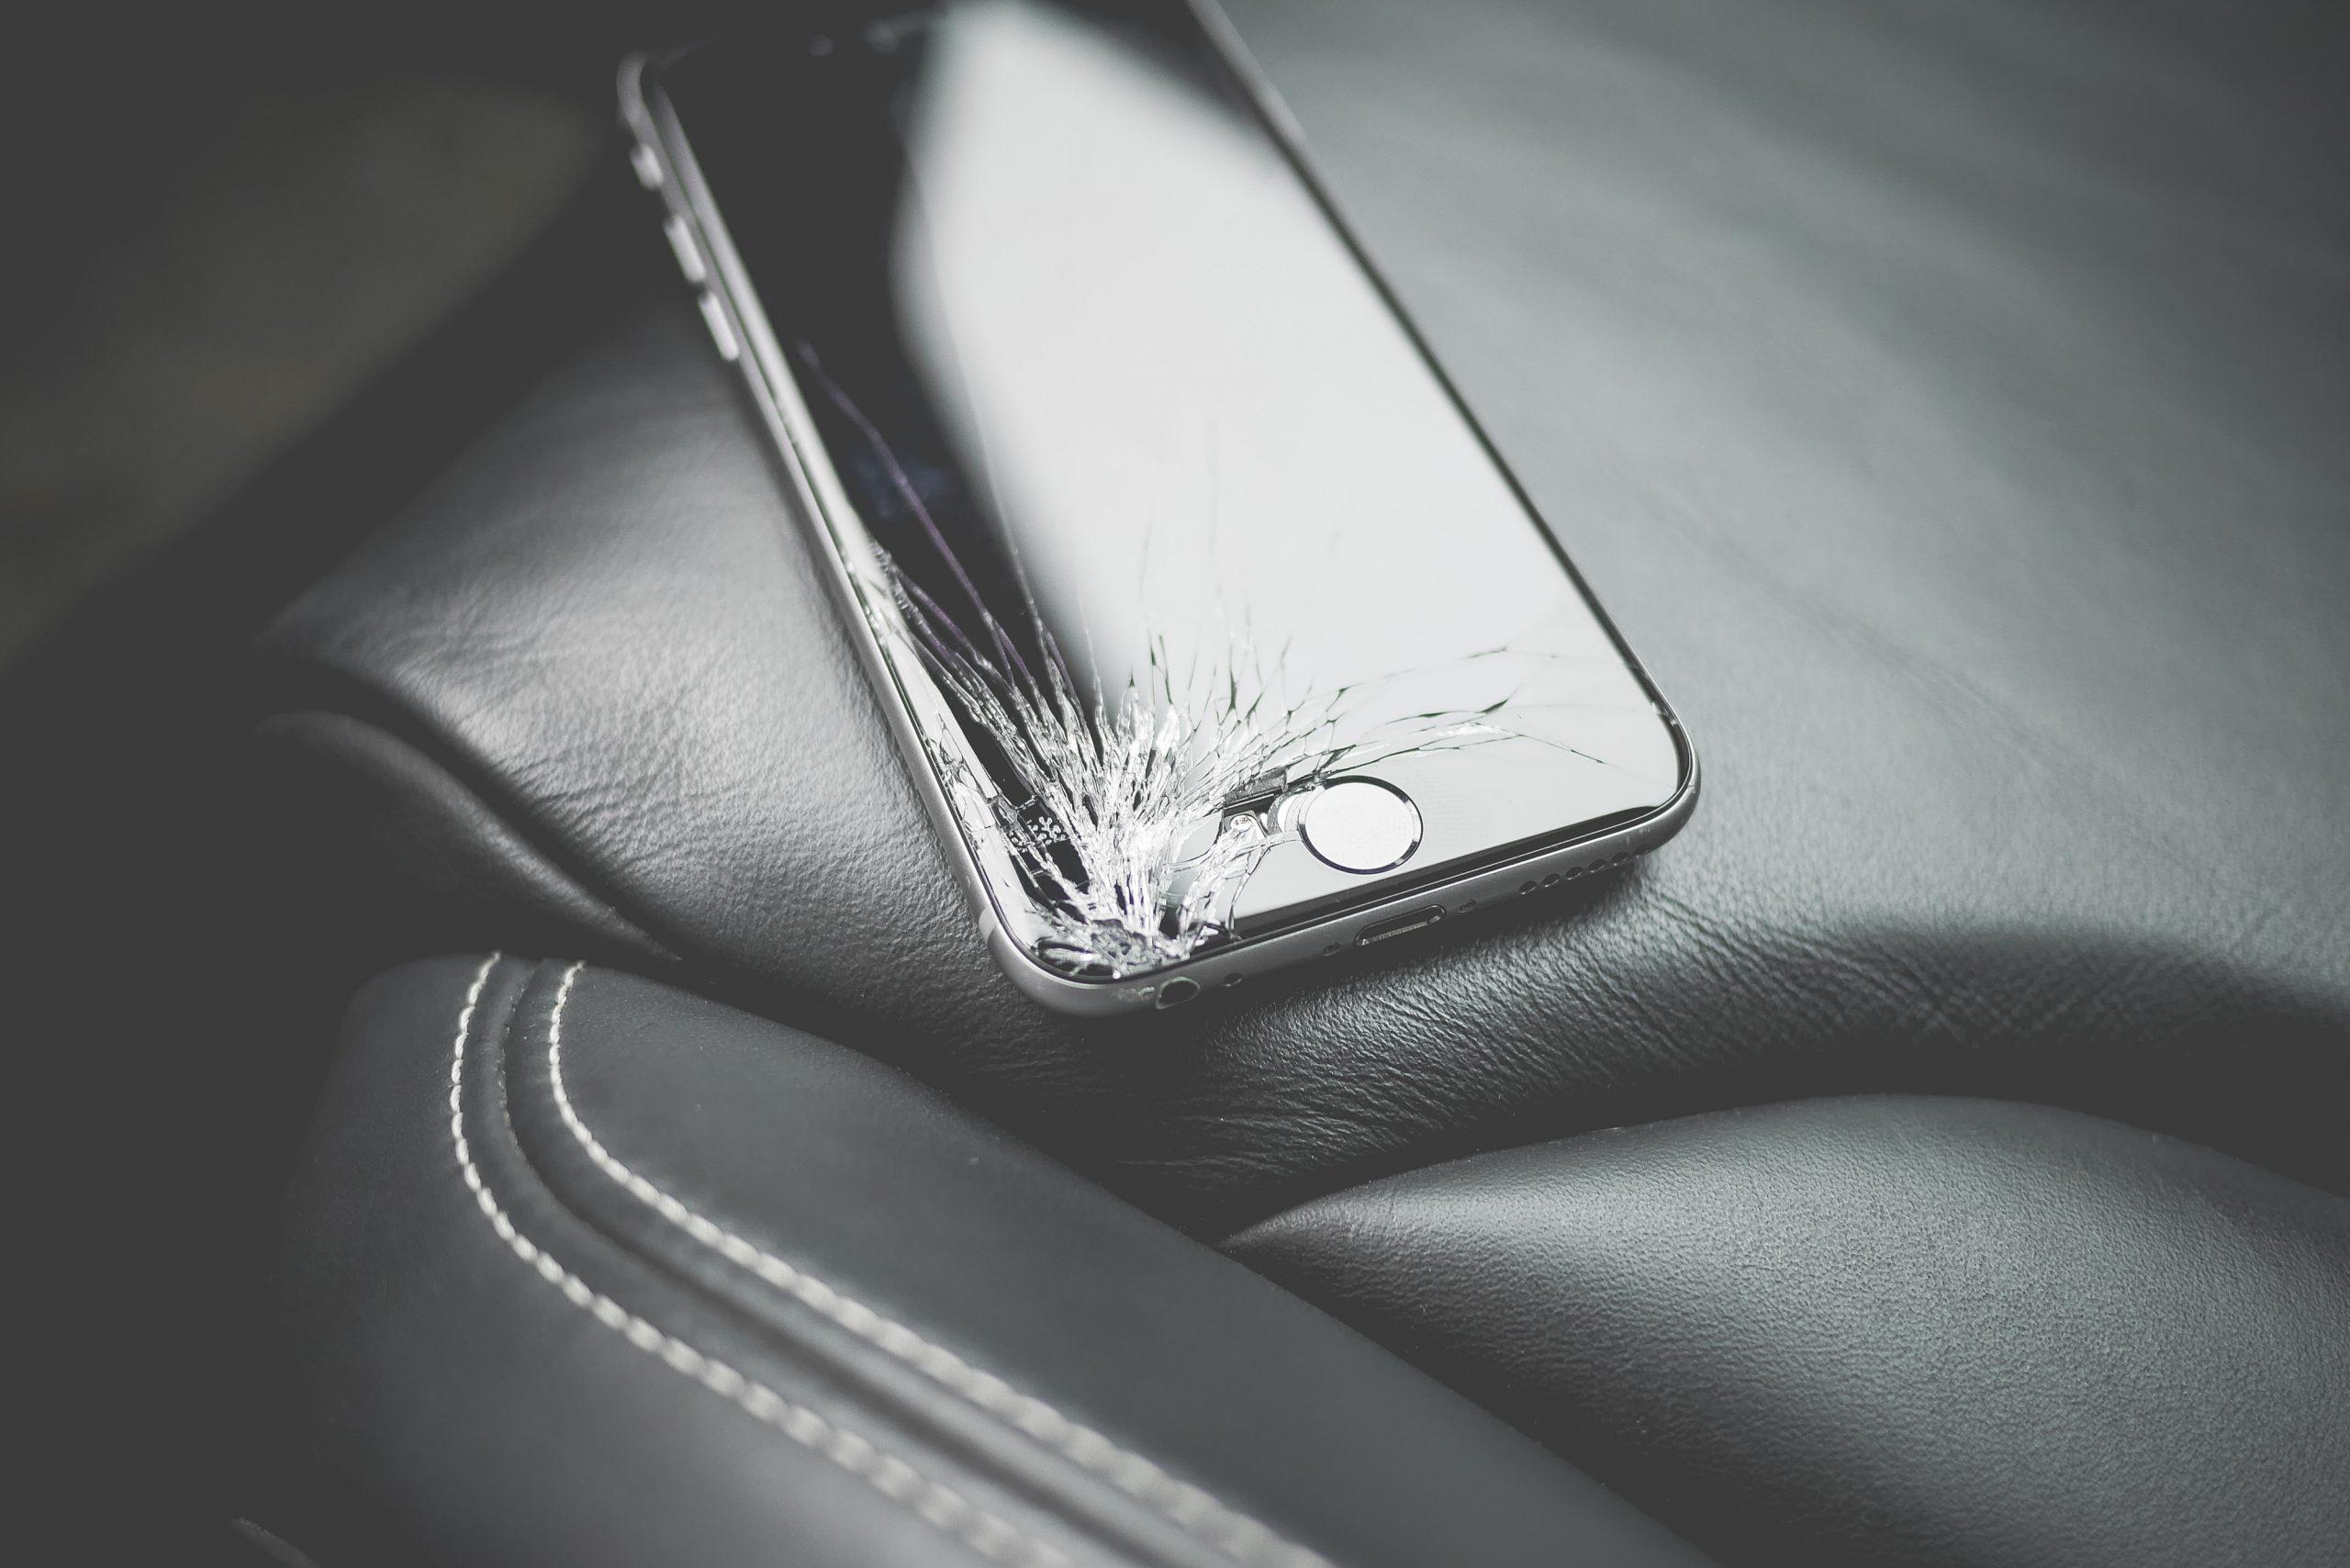 iphone screen repair silverwater